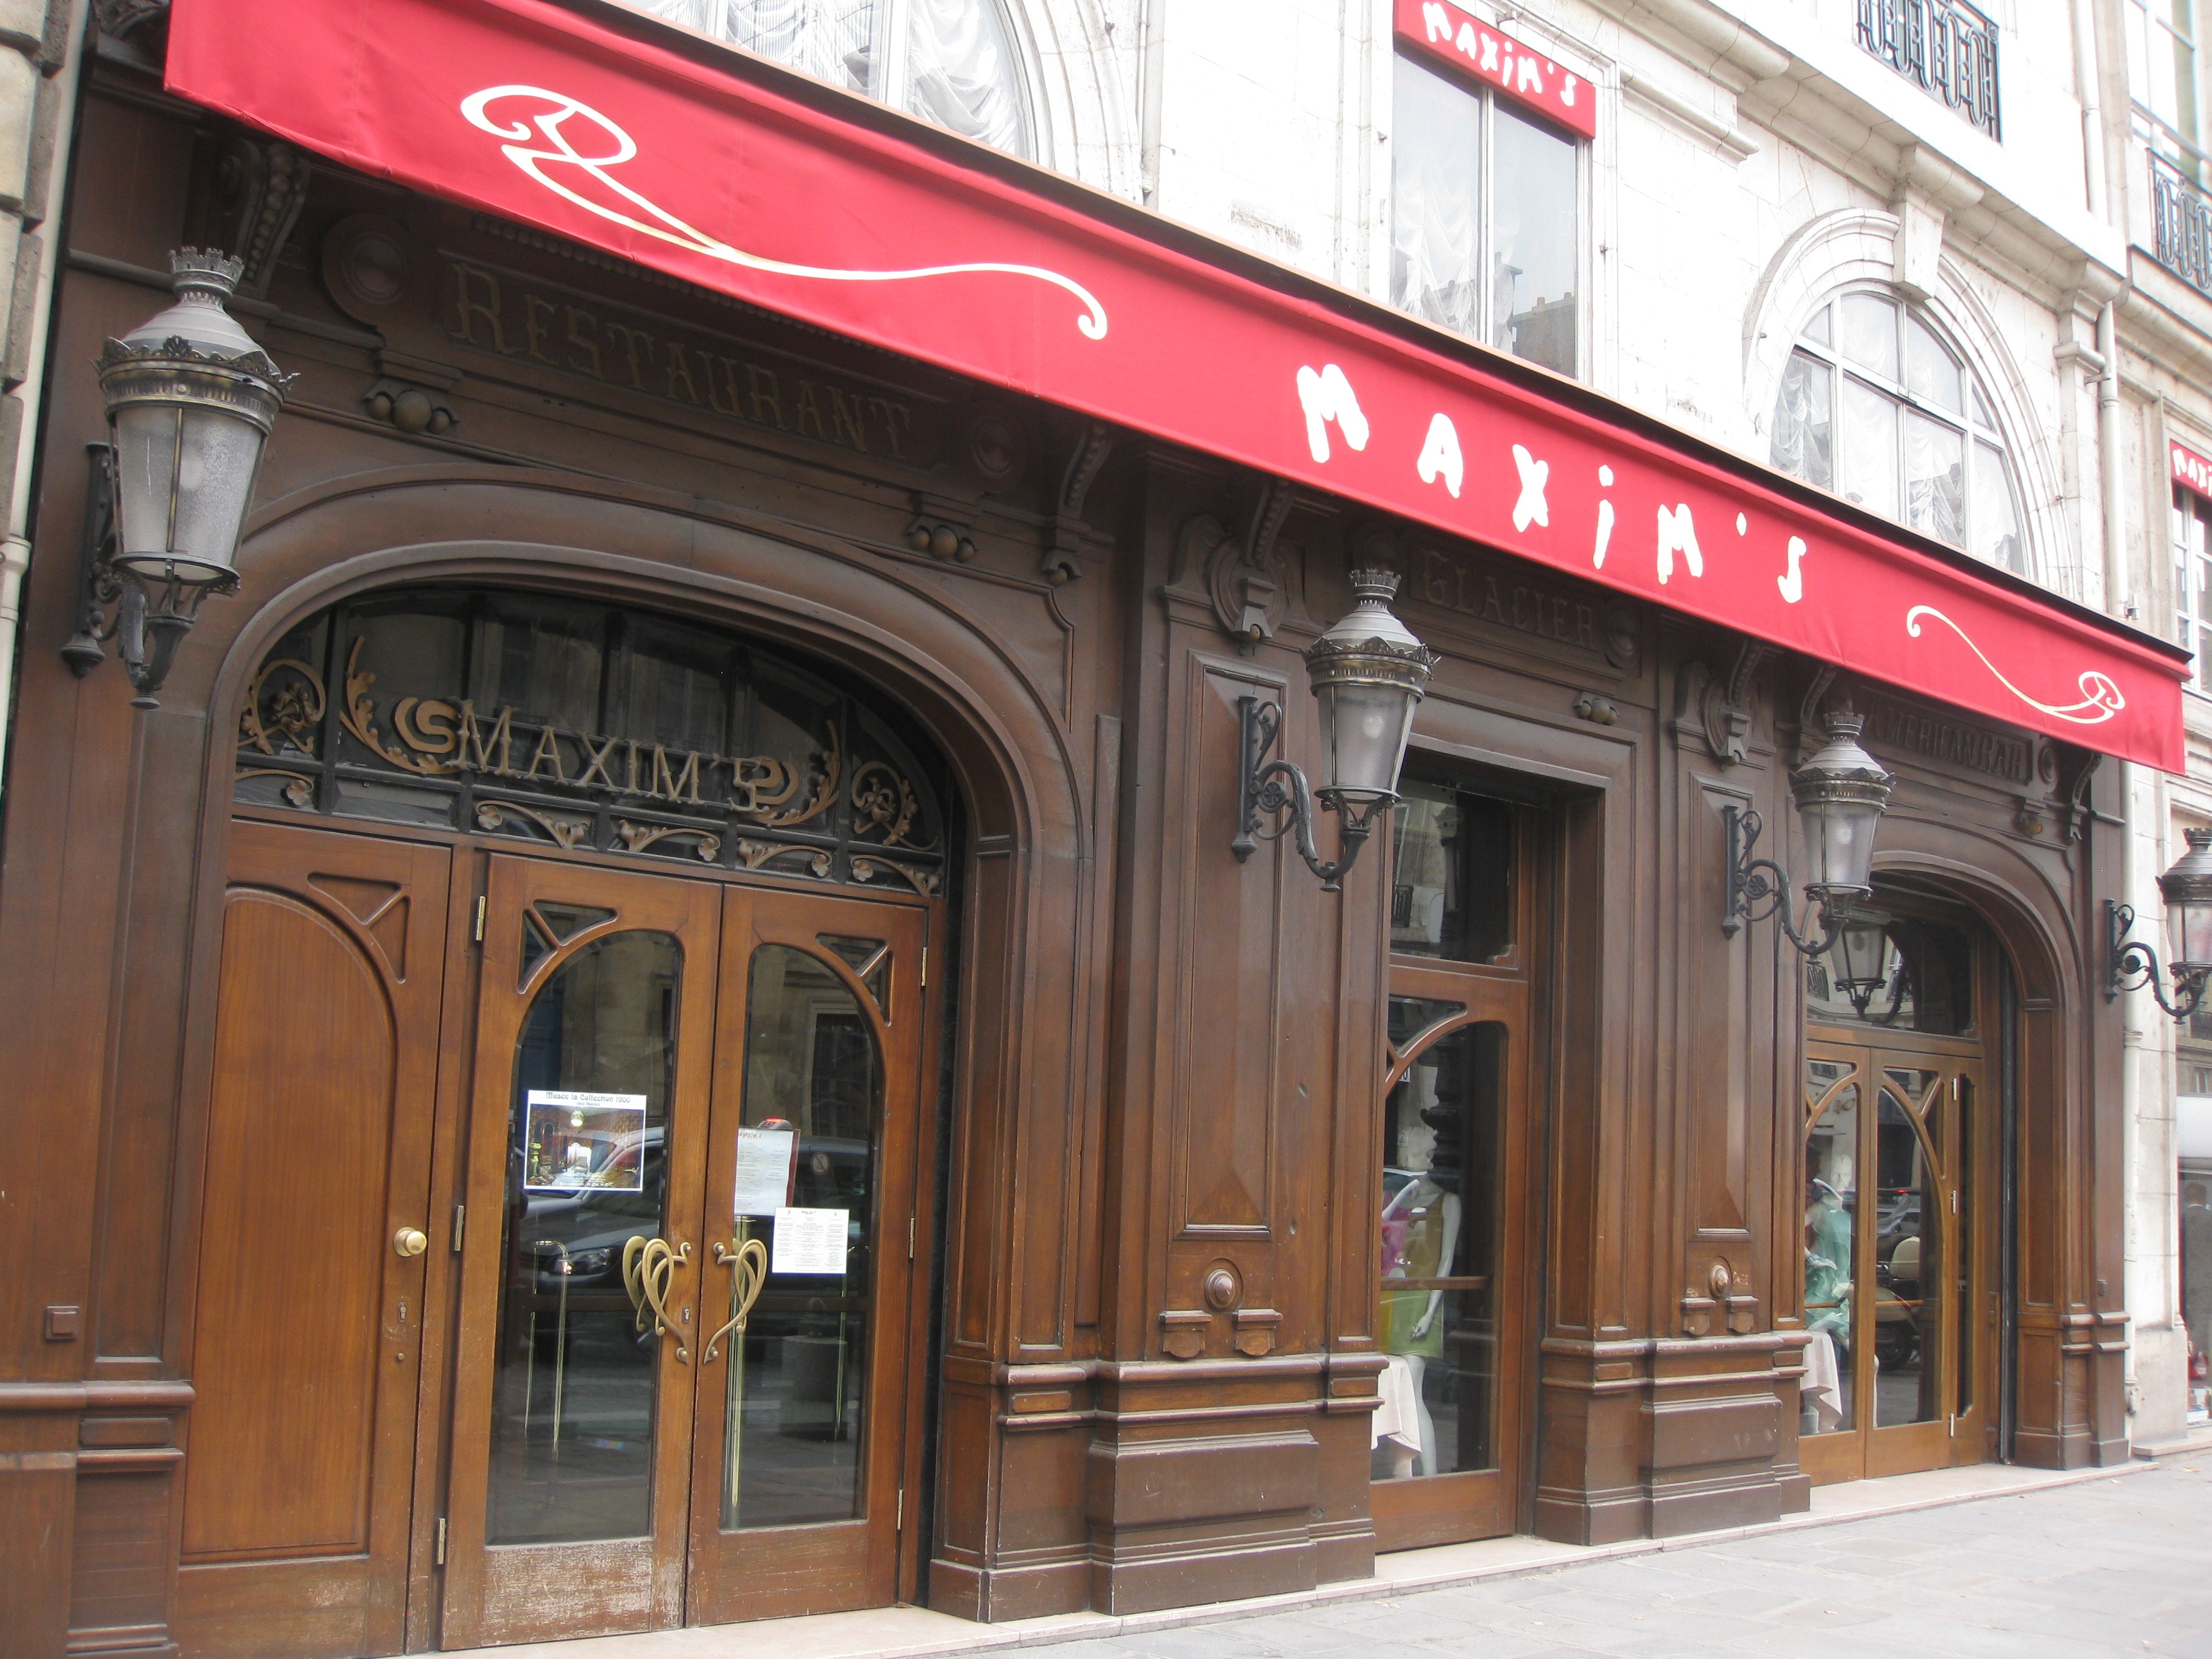 Restaurant Chez France La Cote St Andre Menu Tarif